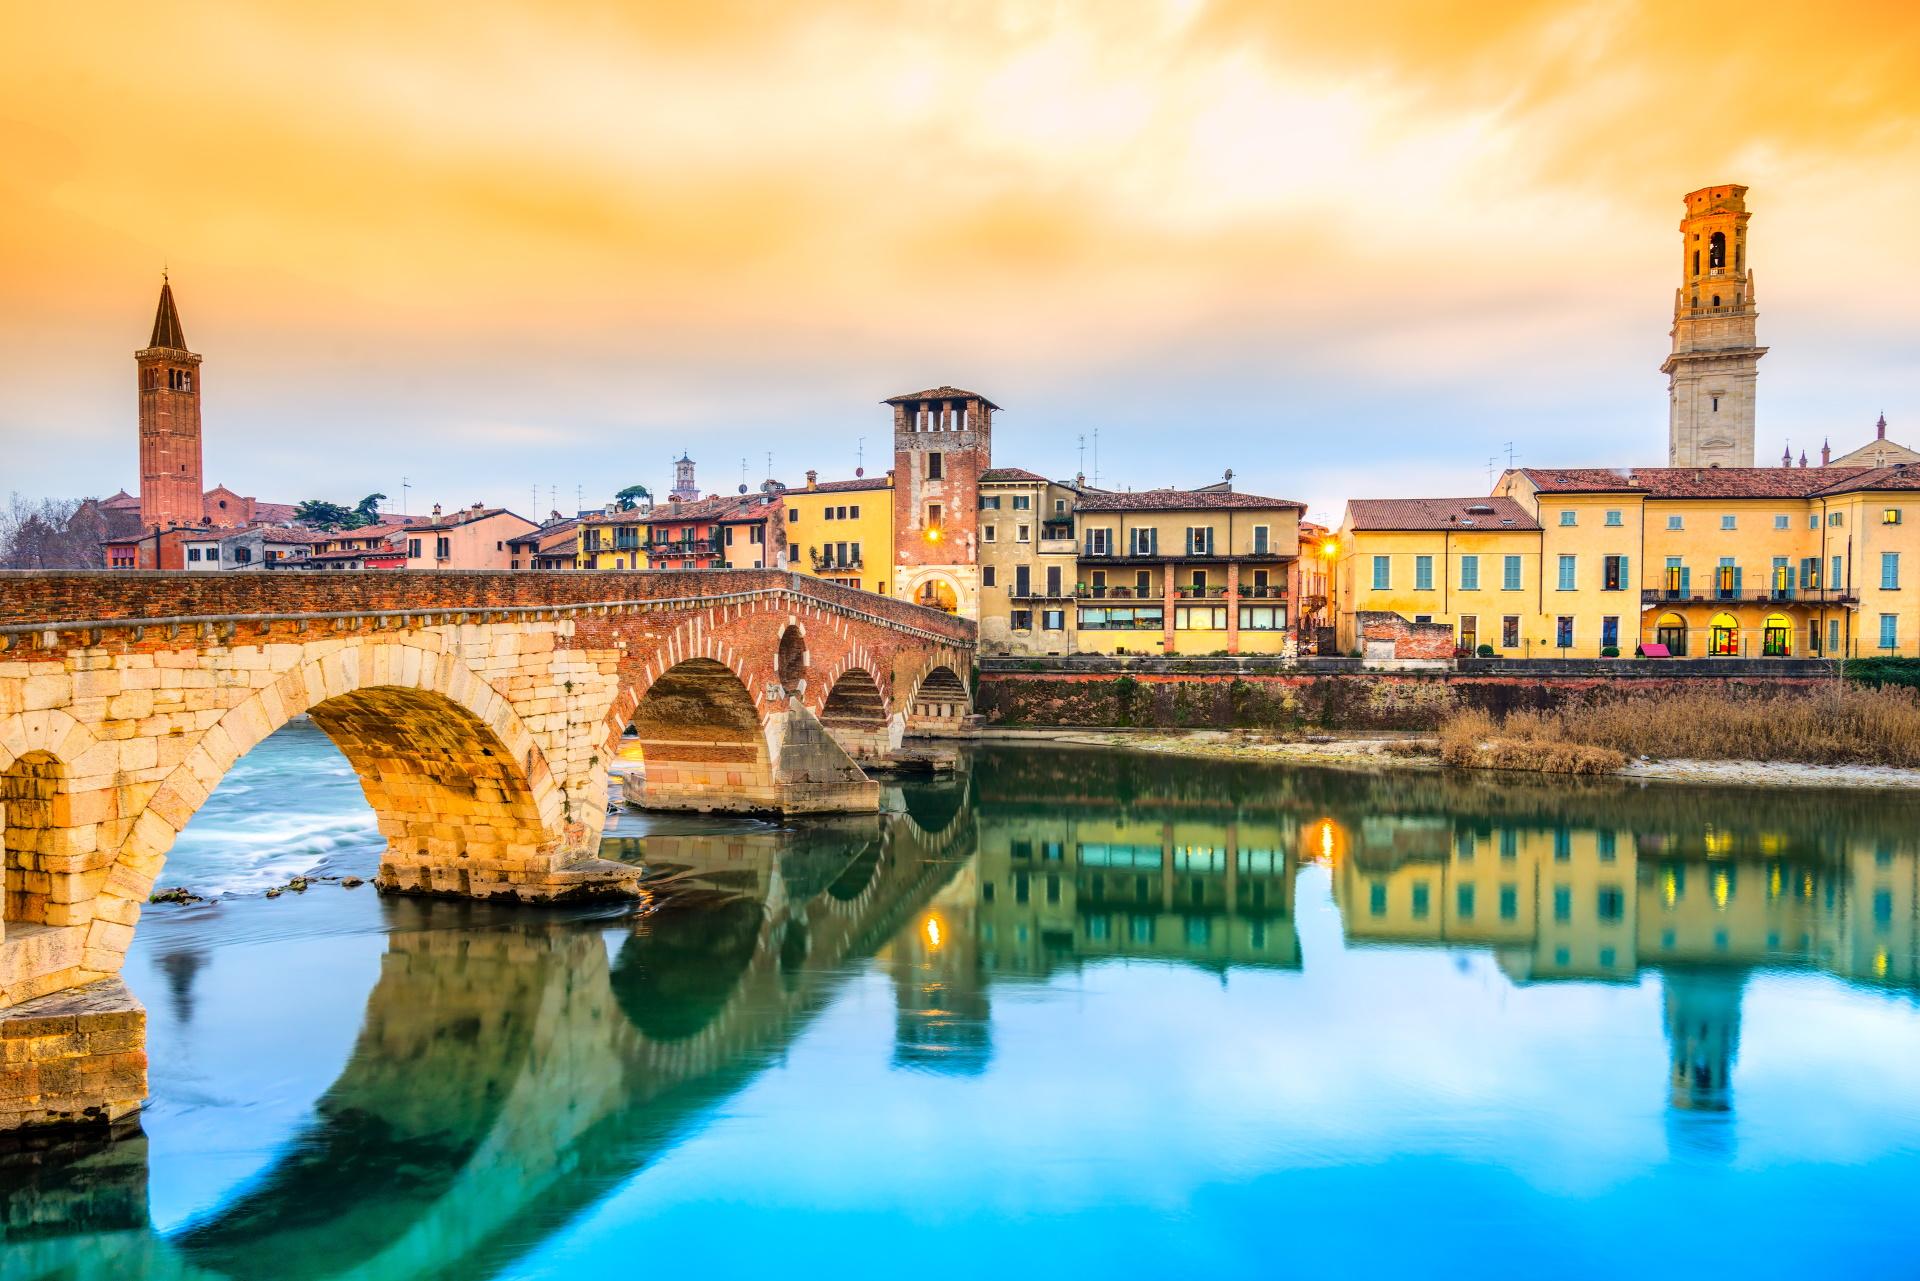 Ponte di Pietra in Verona